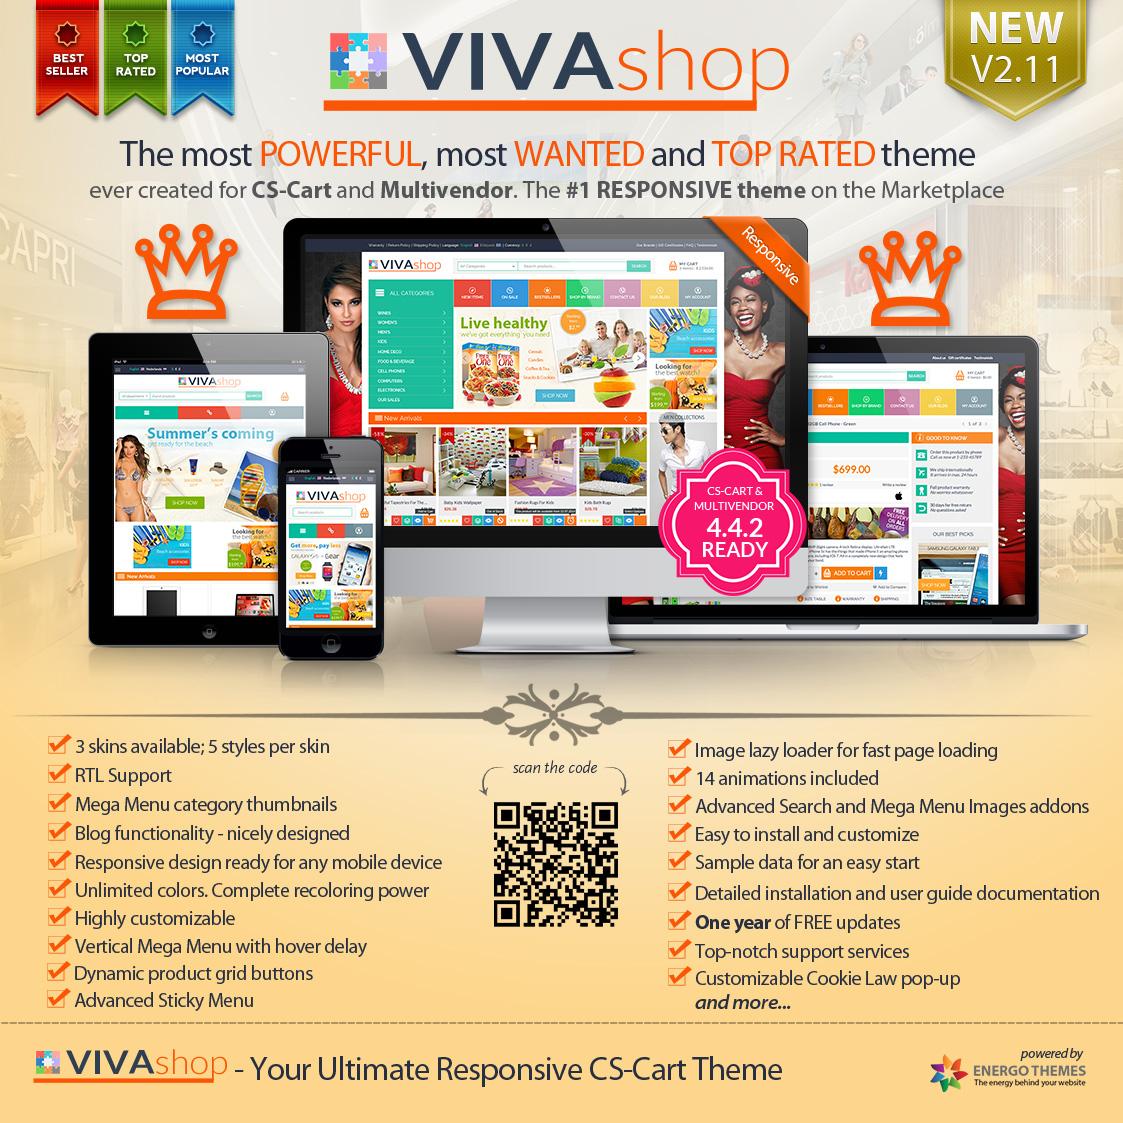 VIVAshop-V2.11-presentation-page-MP.jpg